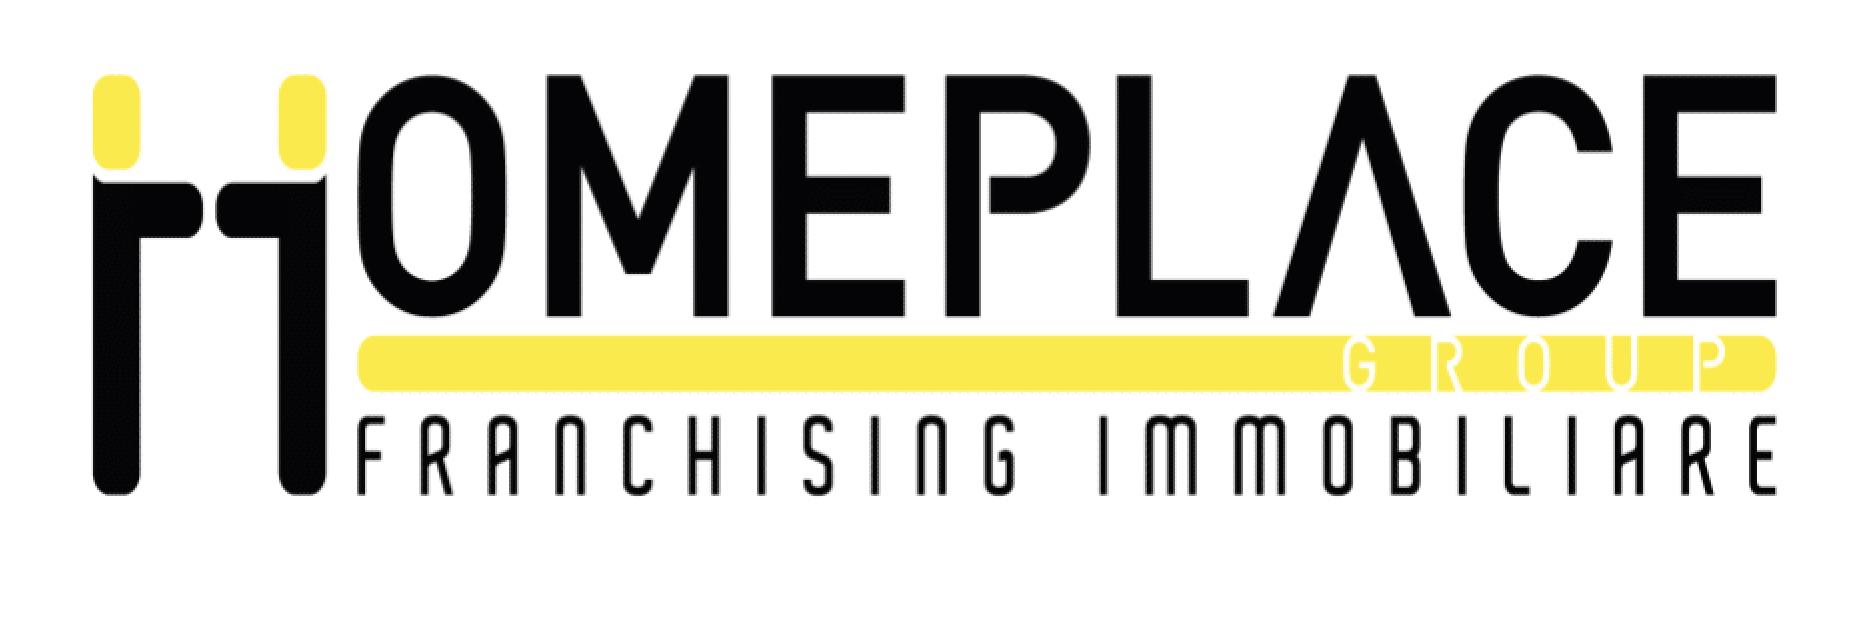 homeplace group logo circolo chigi